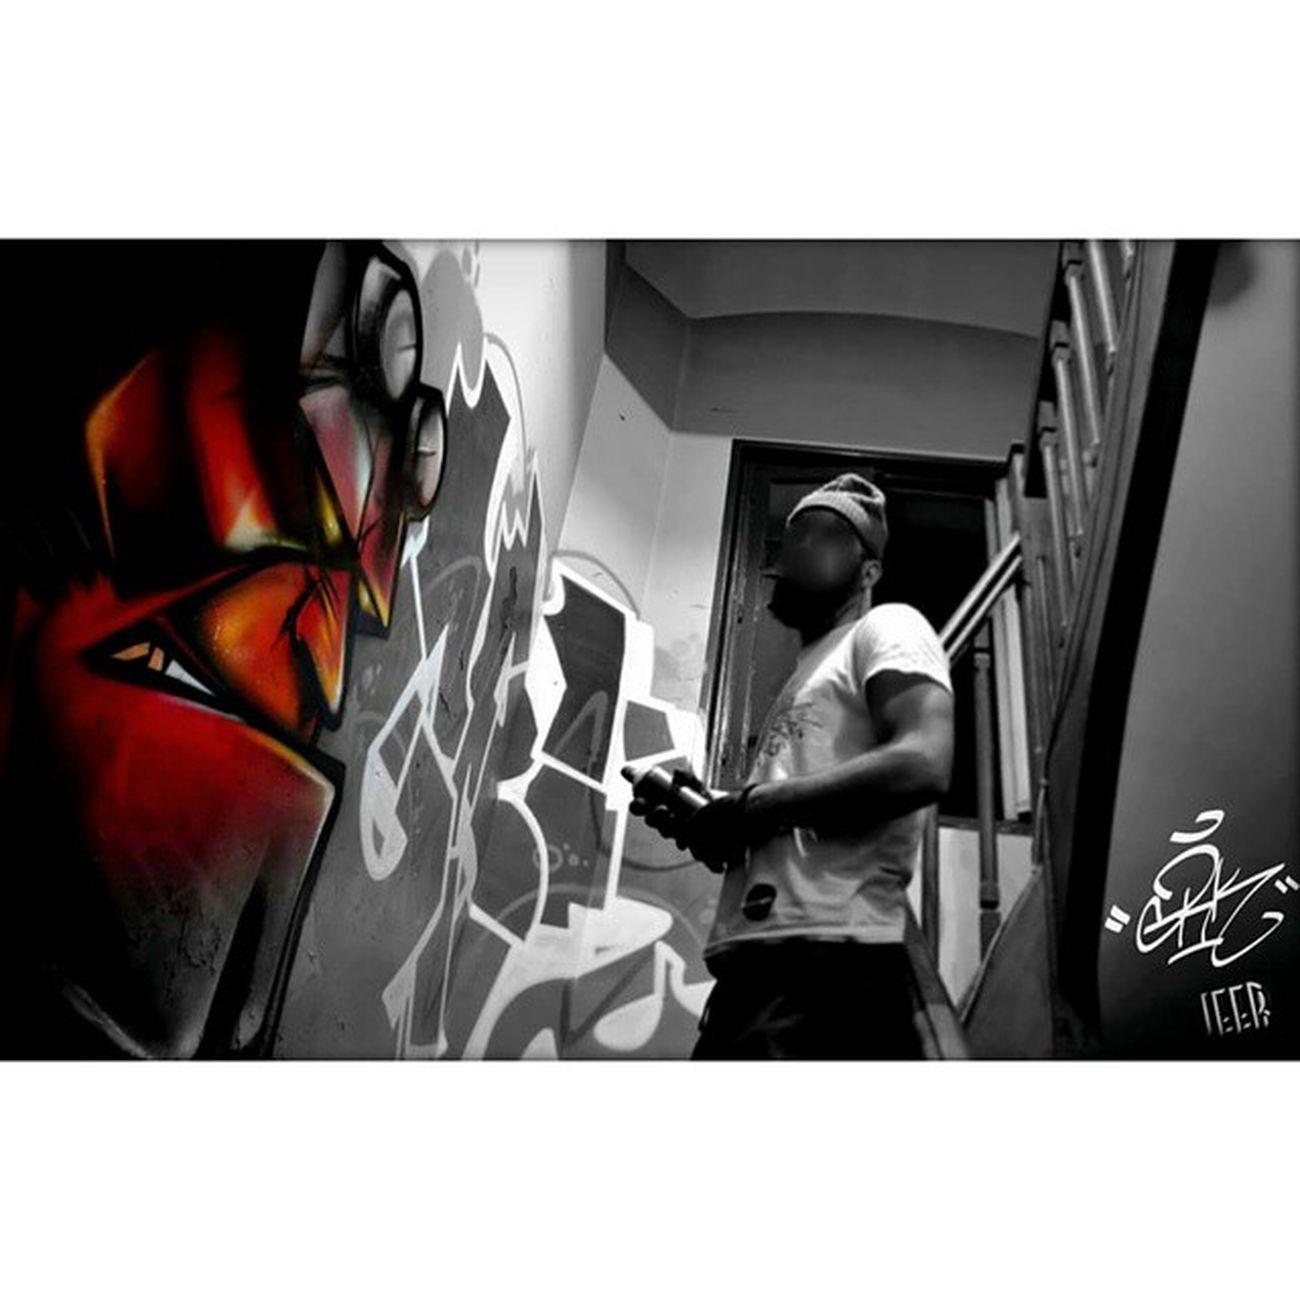 GRK 👥🎨 KEBI/ASKOM Graffitiwall Graffitiart Graffiti Grkcrew Grkingz GRK Vandal Goldrushkingz